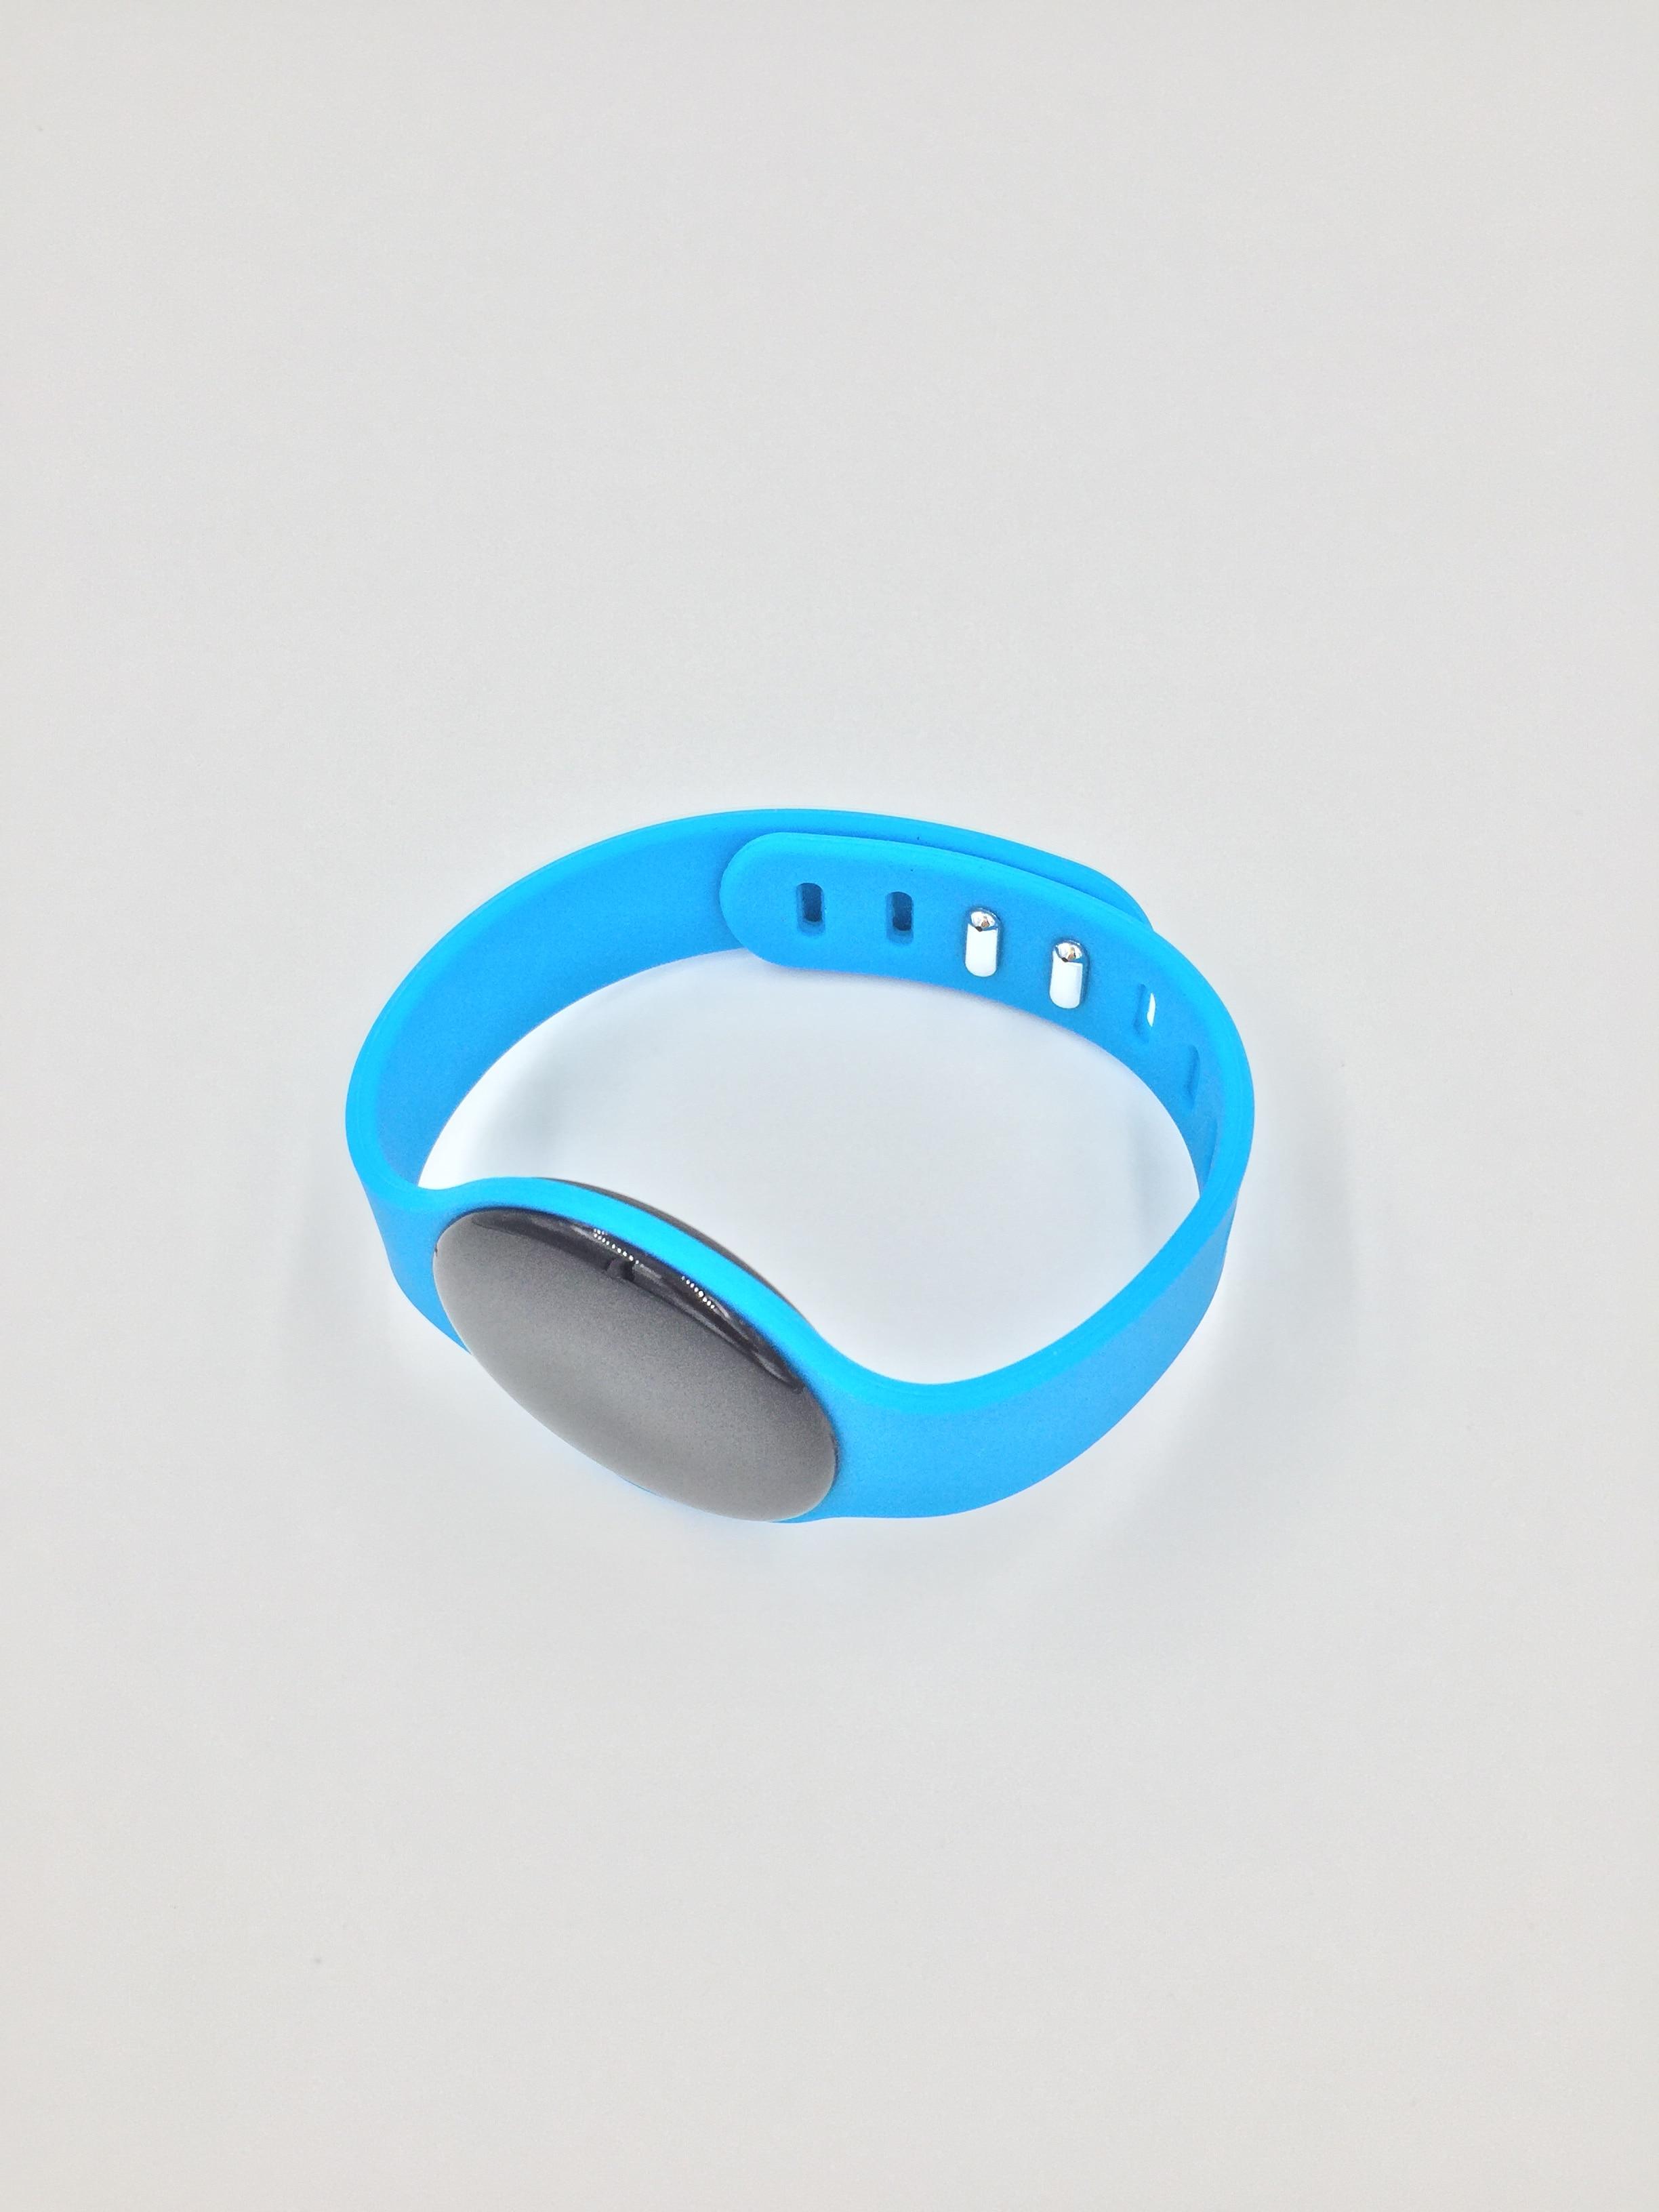 New product! NRF51822 Bracelet development board<br>